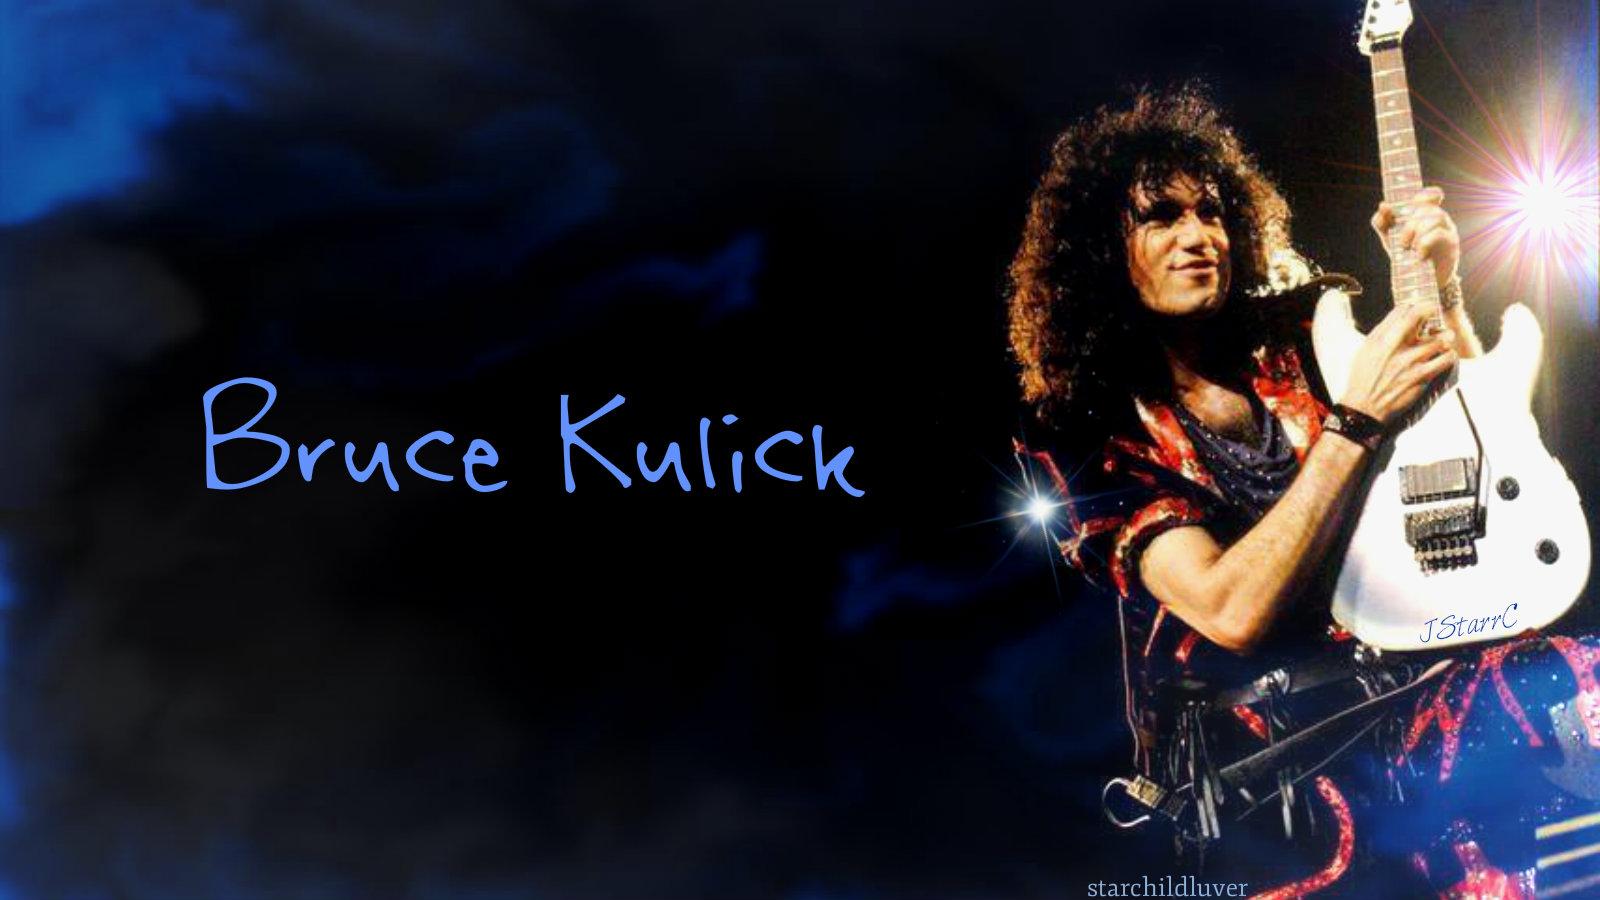 kiss bruce kulick: